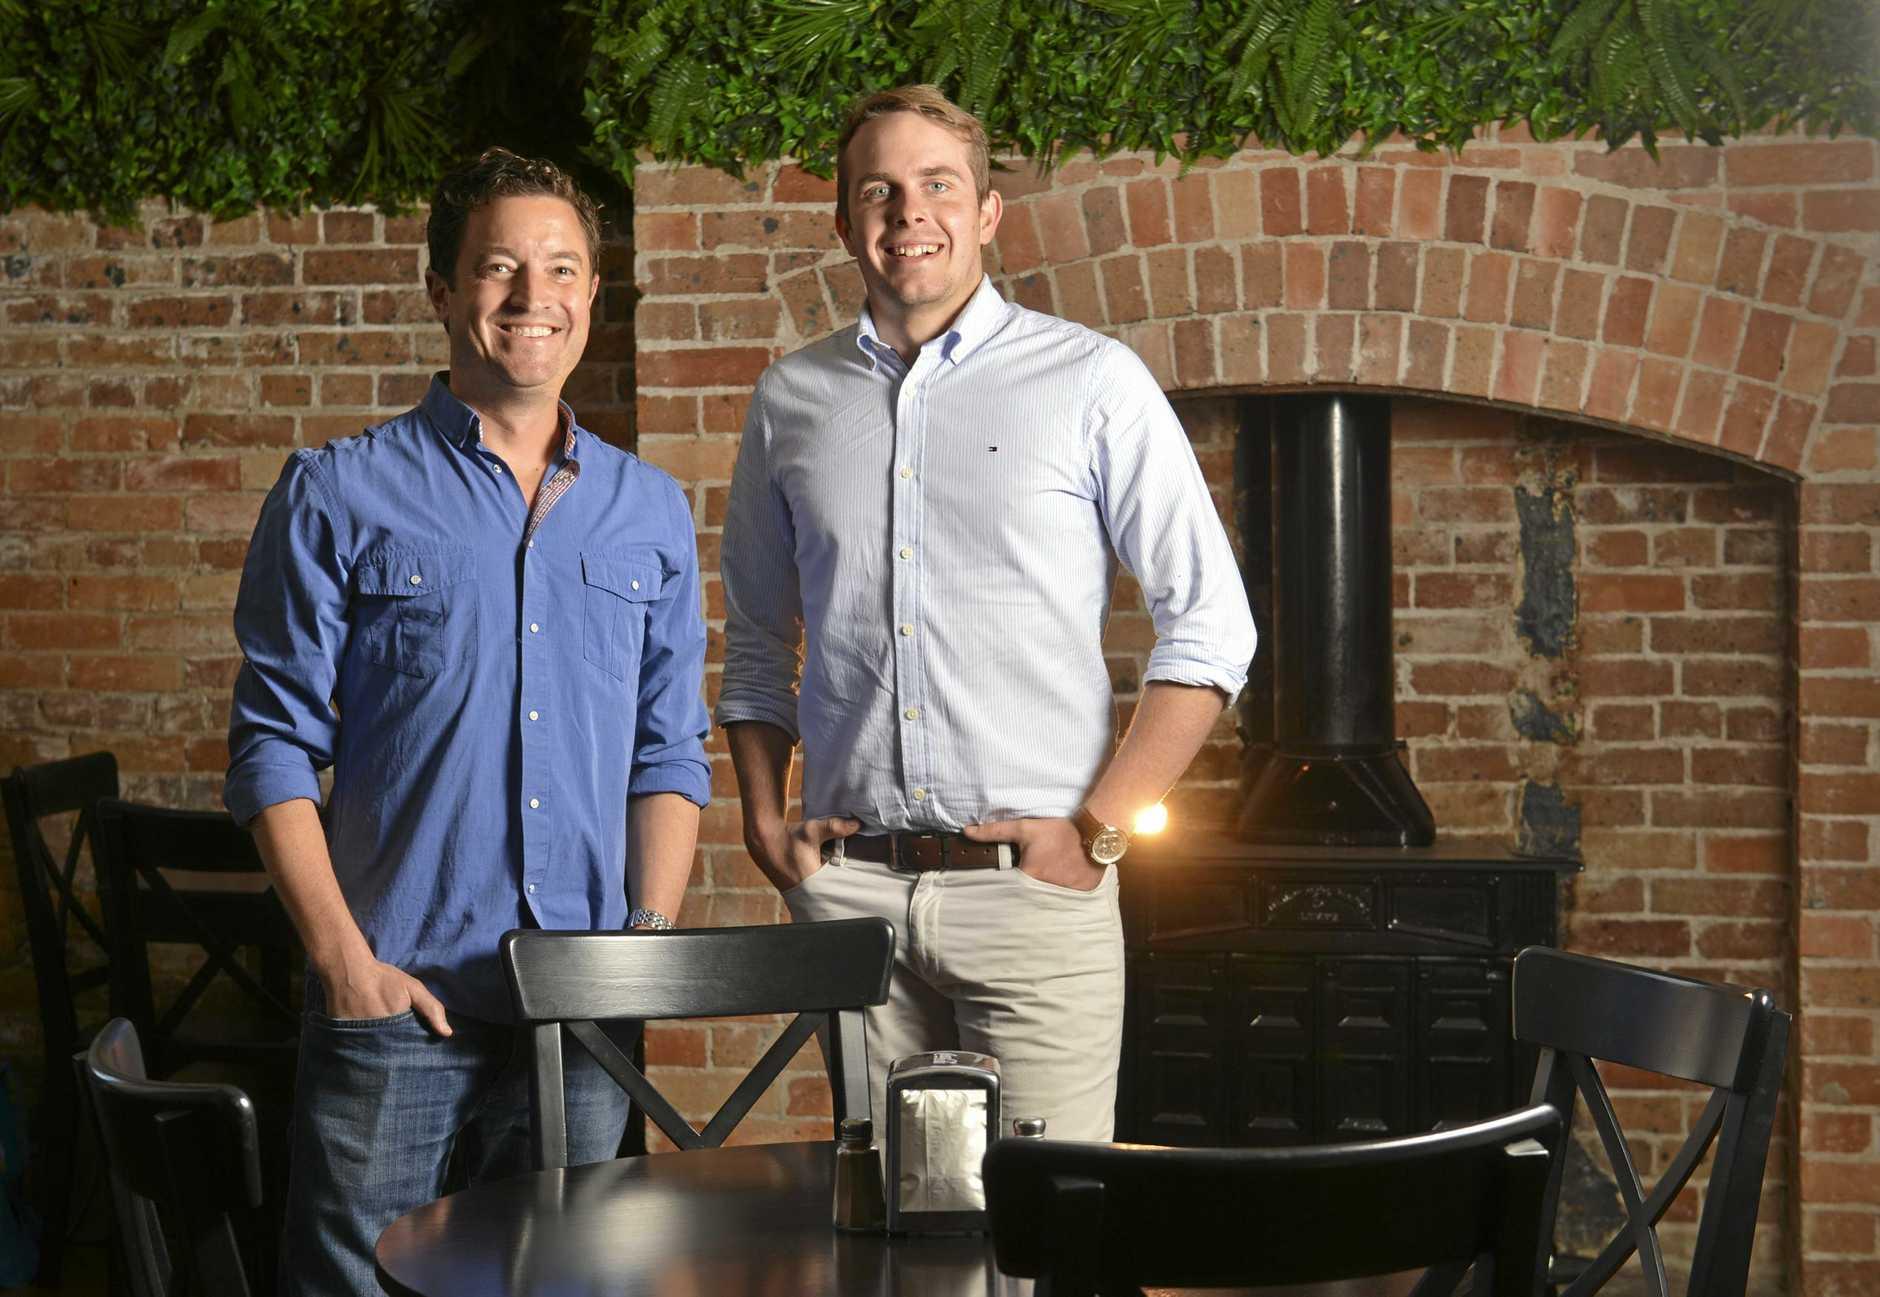 Event Manager Nate Hillig and Owner of Charlies Bar Kitchen Blake Hamlyn.